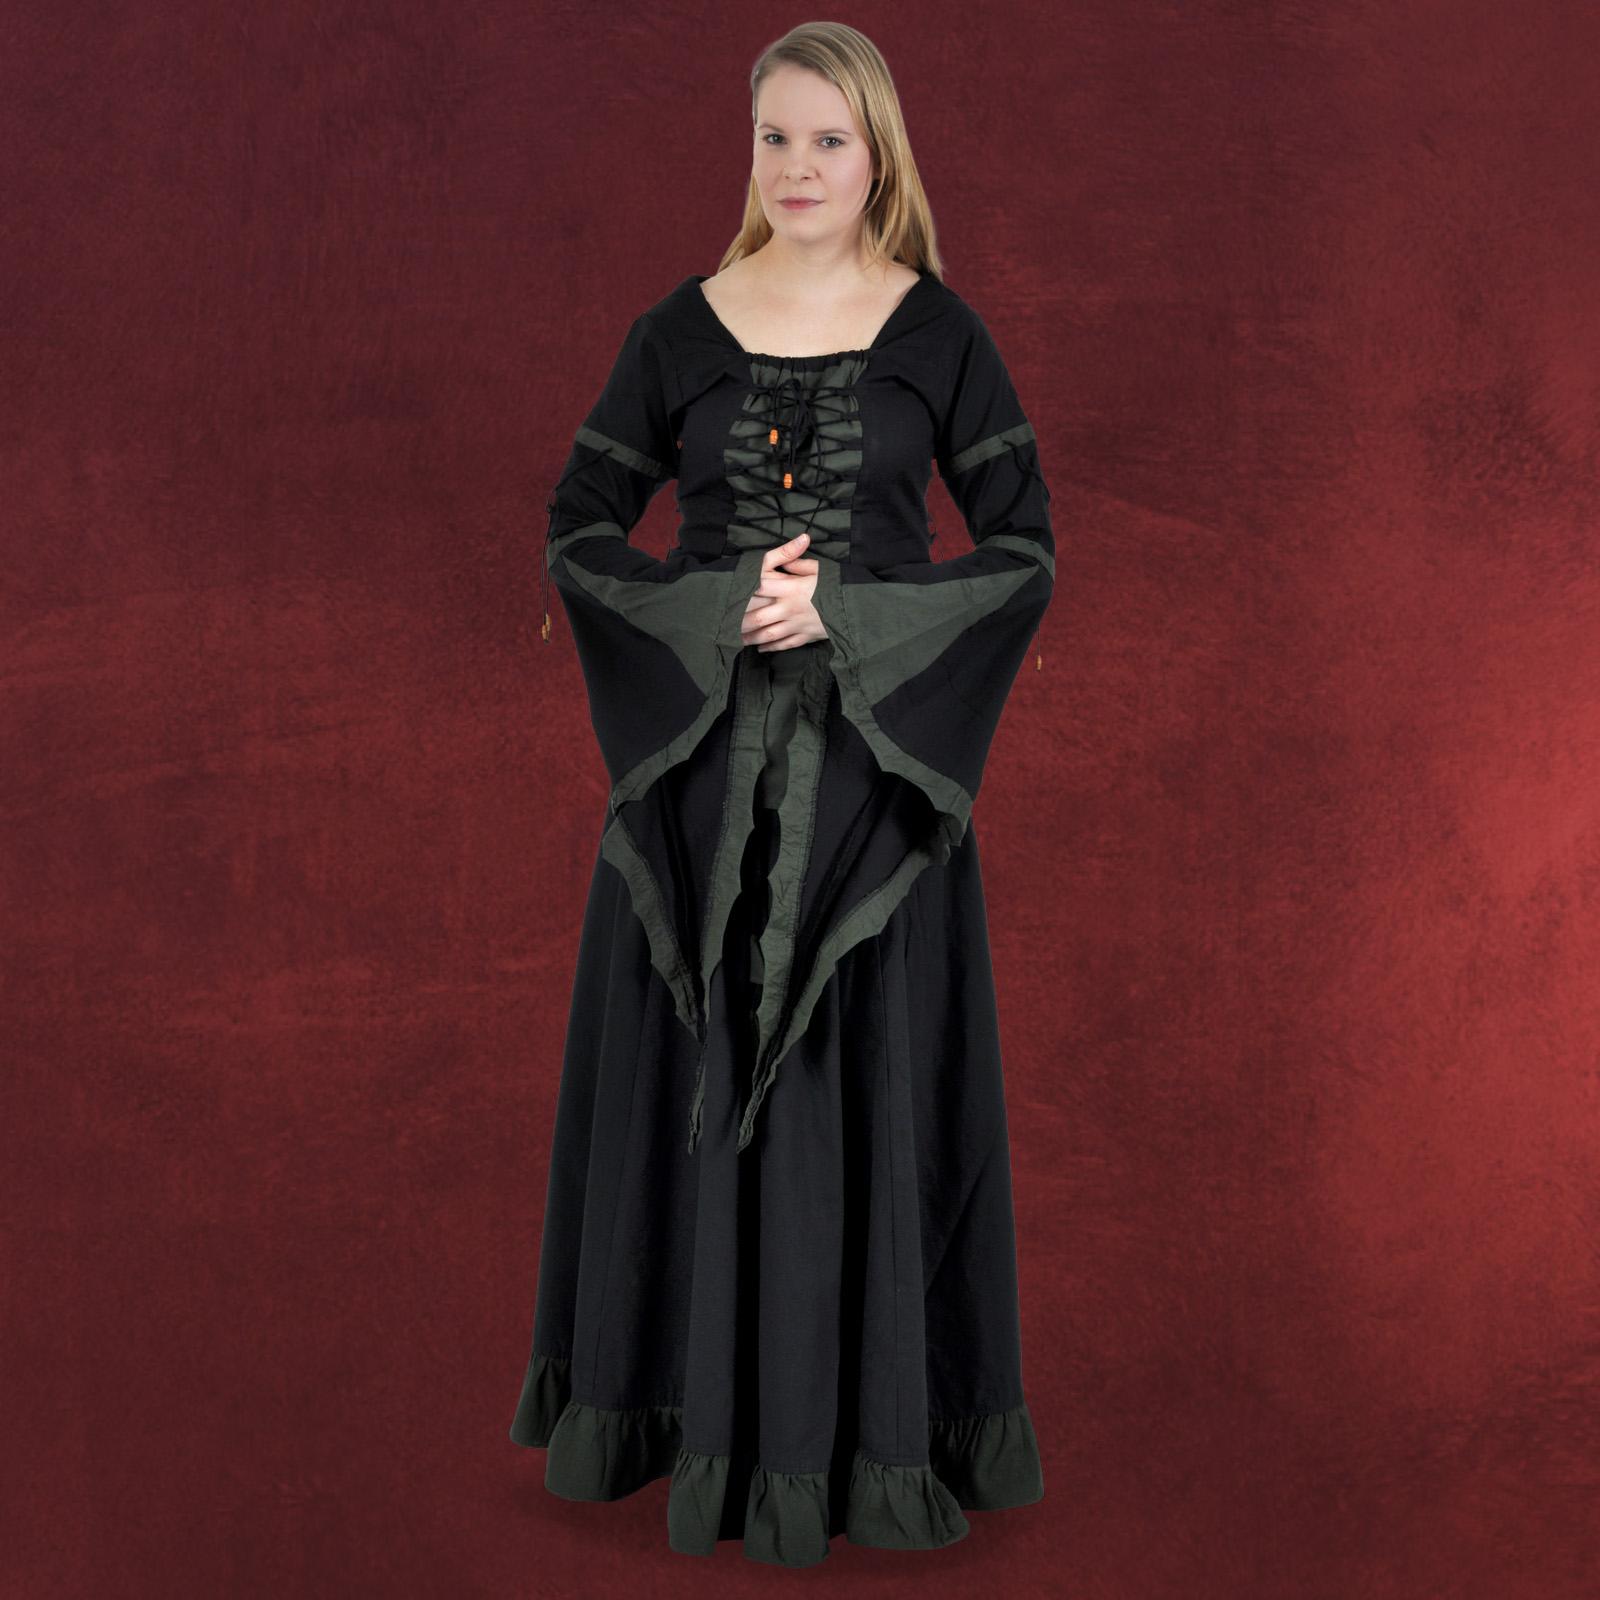 mittelalter bluse im korsagen stil schwarz gr n lange trompeten rmel schn rung ebay. Black Bedroom Furniture Sets. Home Design Ideas